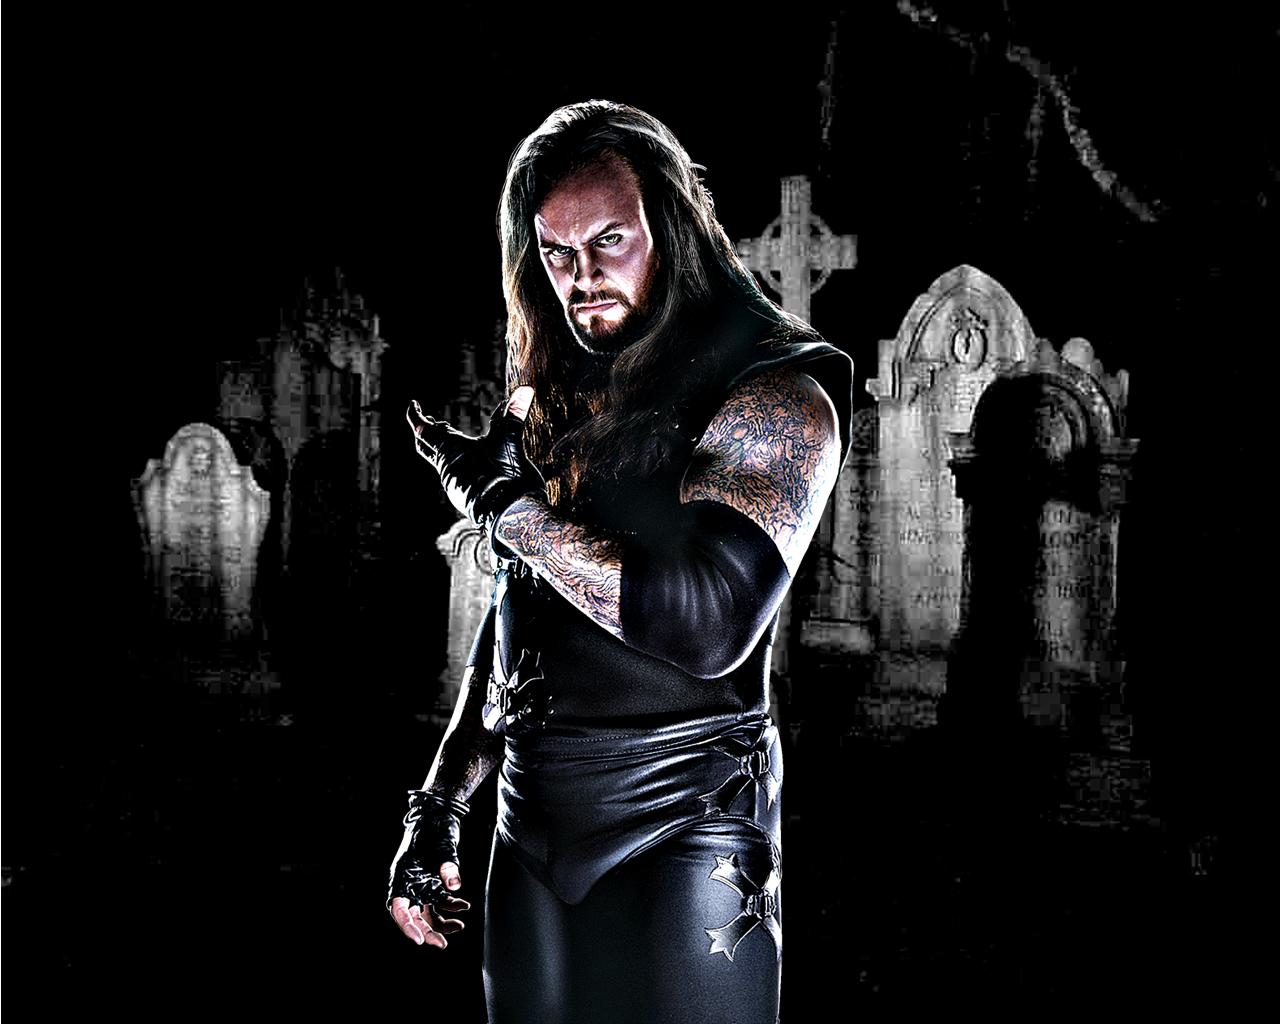 Undertaker Wallpapers Wallpaper Cave Undertaker Undertaker Wwe Wwe